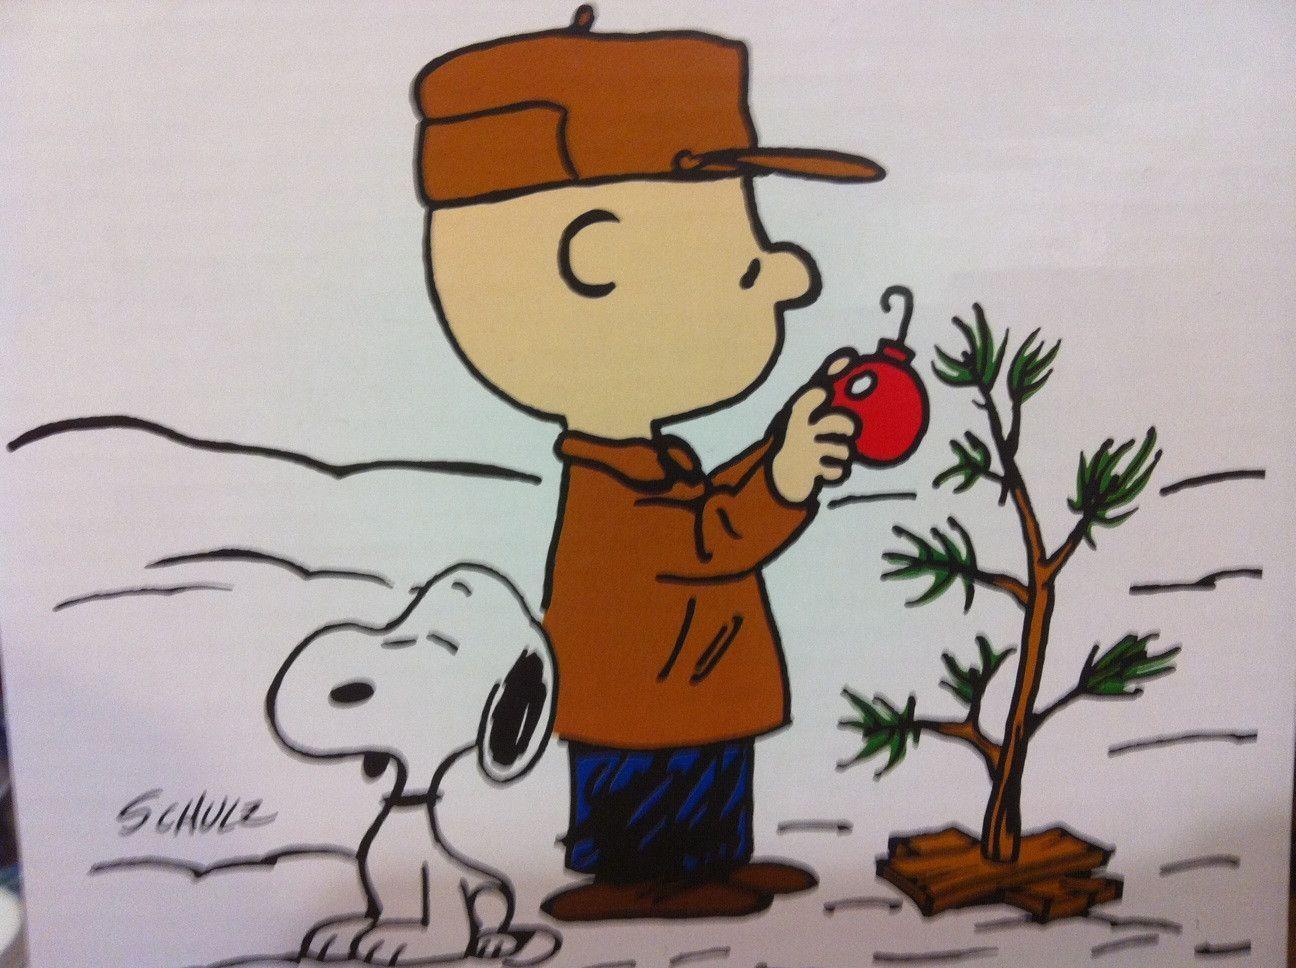 Charlie Brown Christmas Tree Drawing.Charlie Brown Christmas Tree Wallpapers Wallpaper Cave